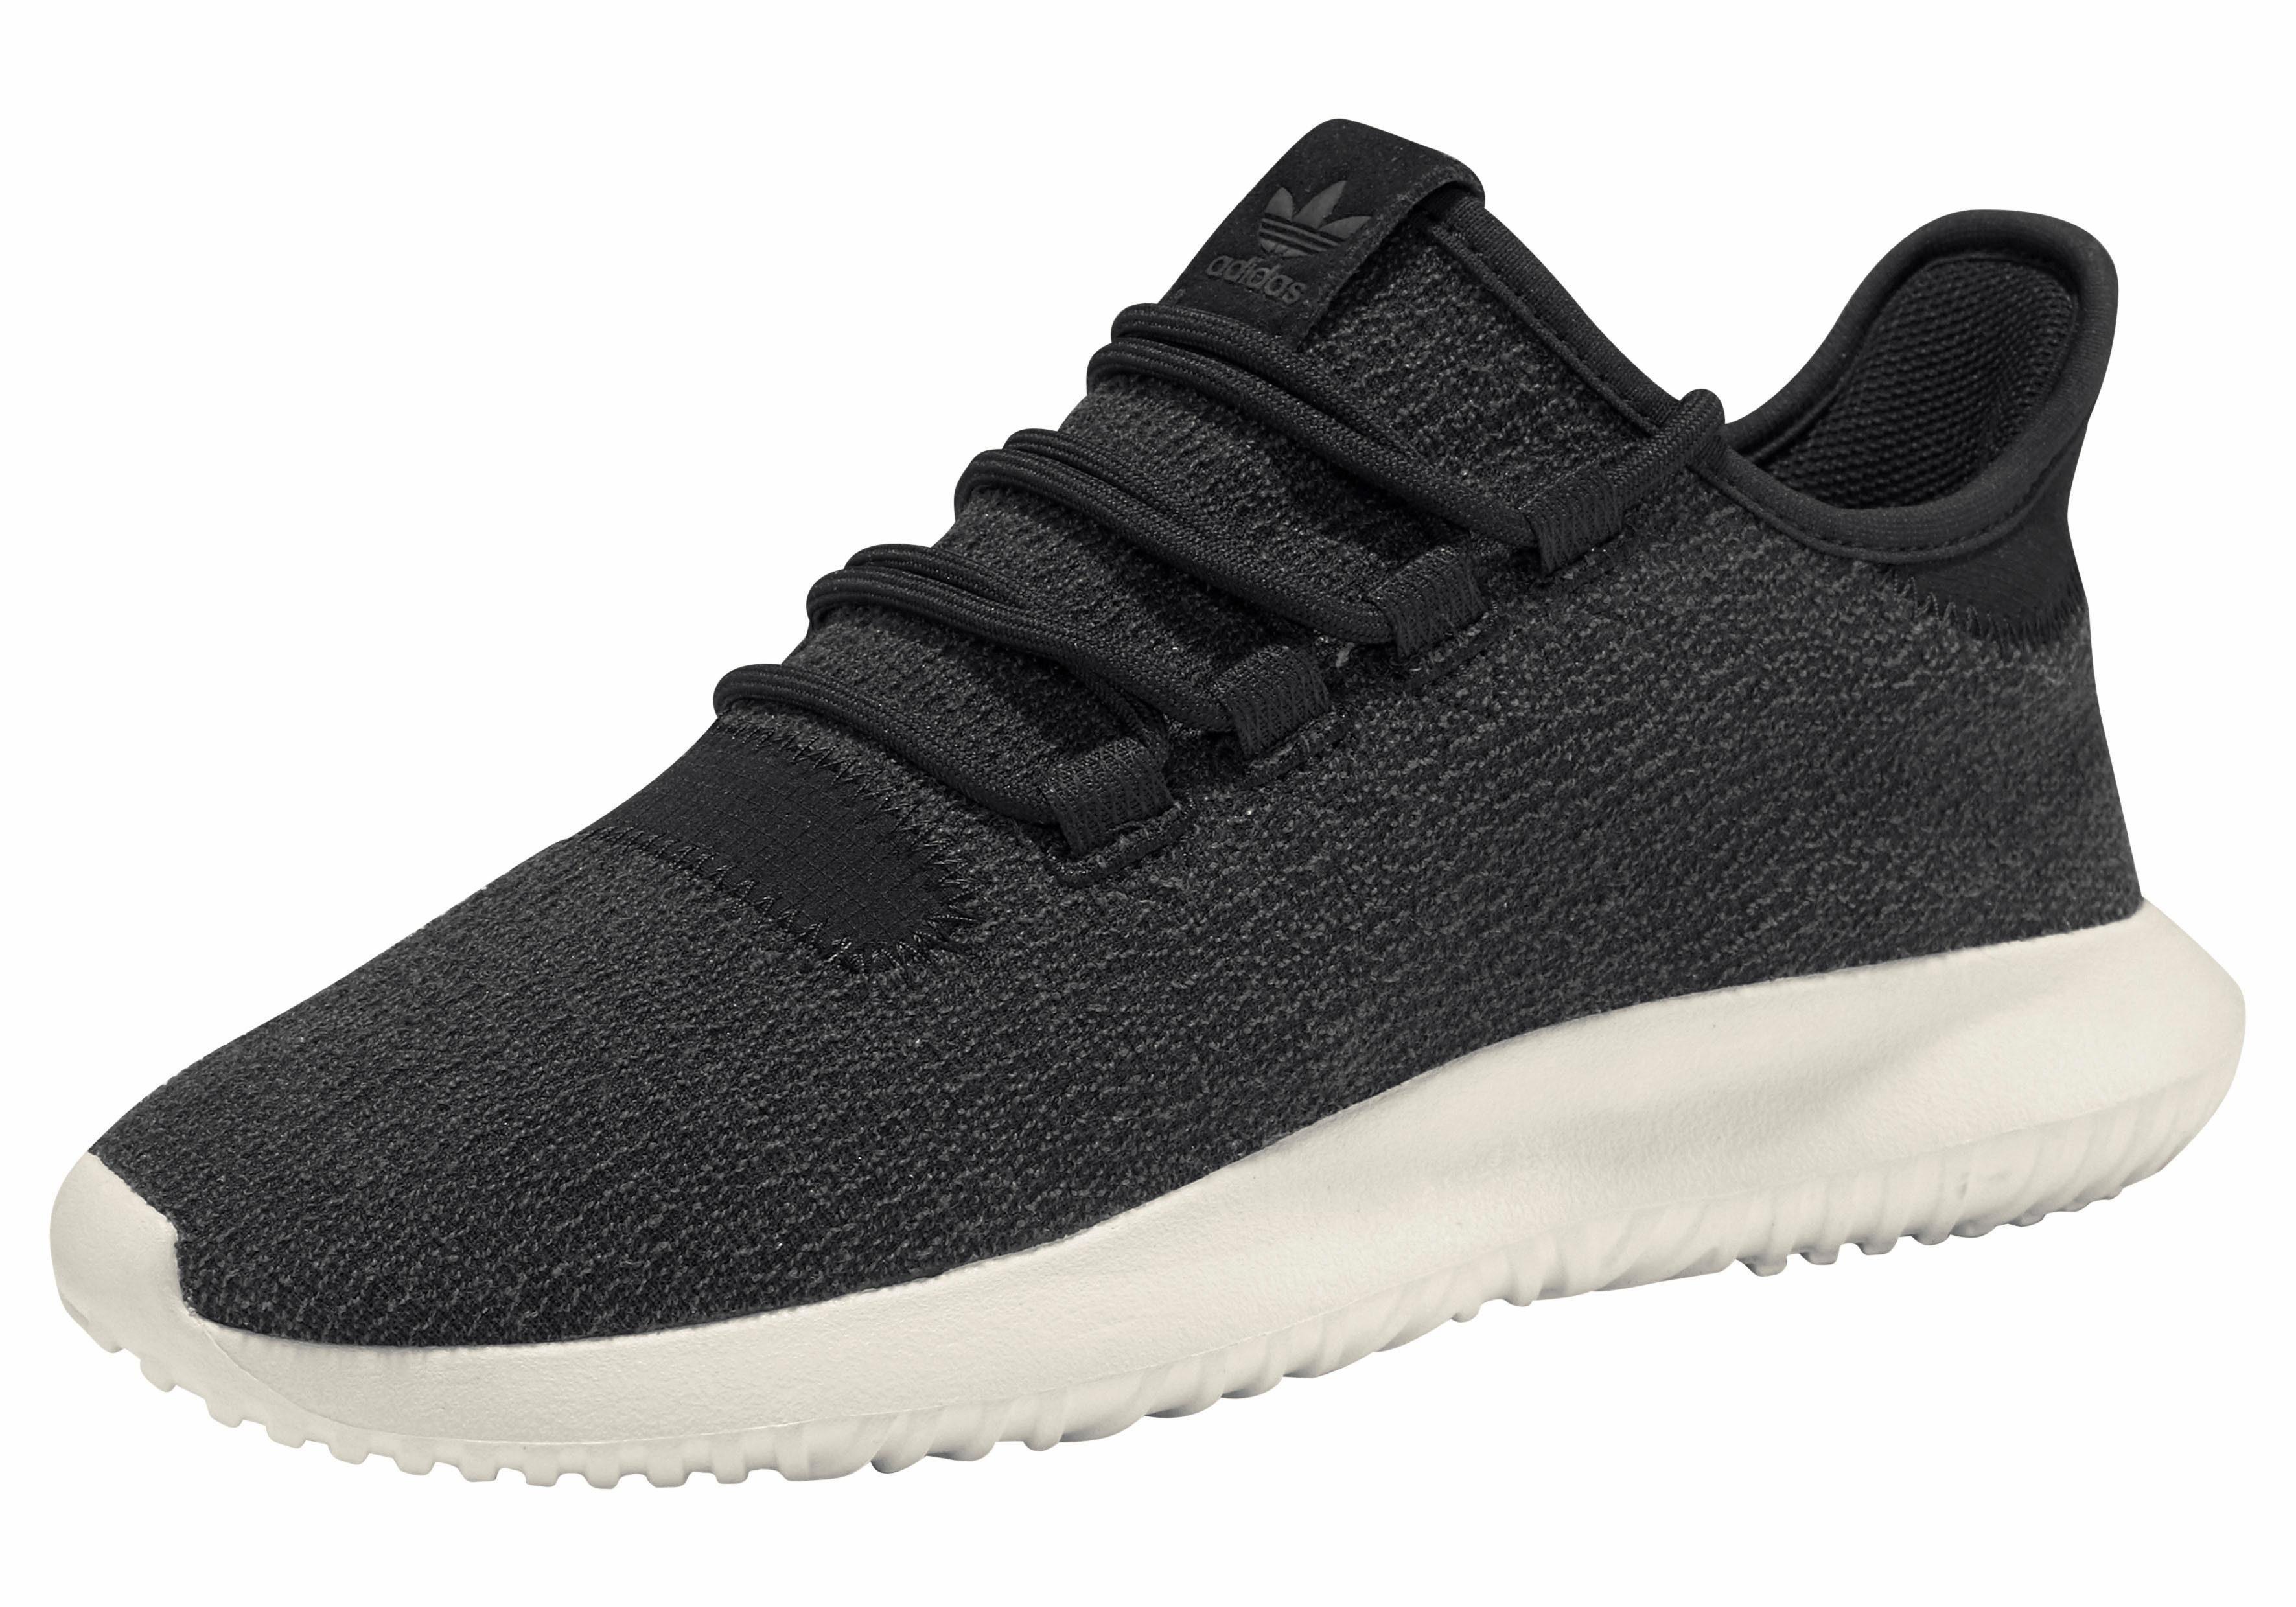 Originaux Adidas Sneakers Ombre Tubulaire Couche W « Noir ckBoaCX